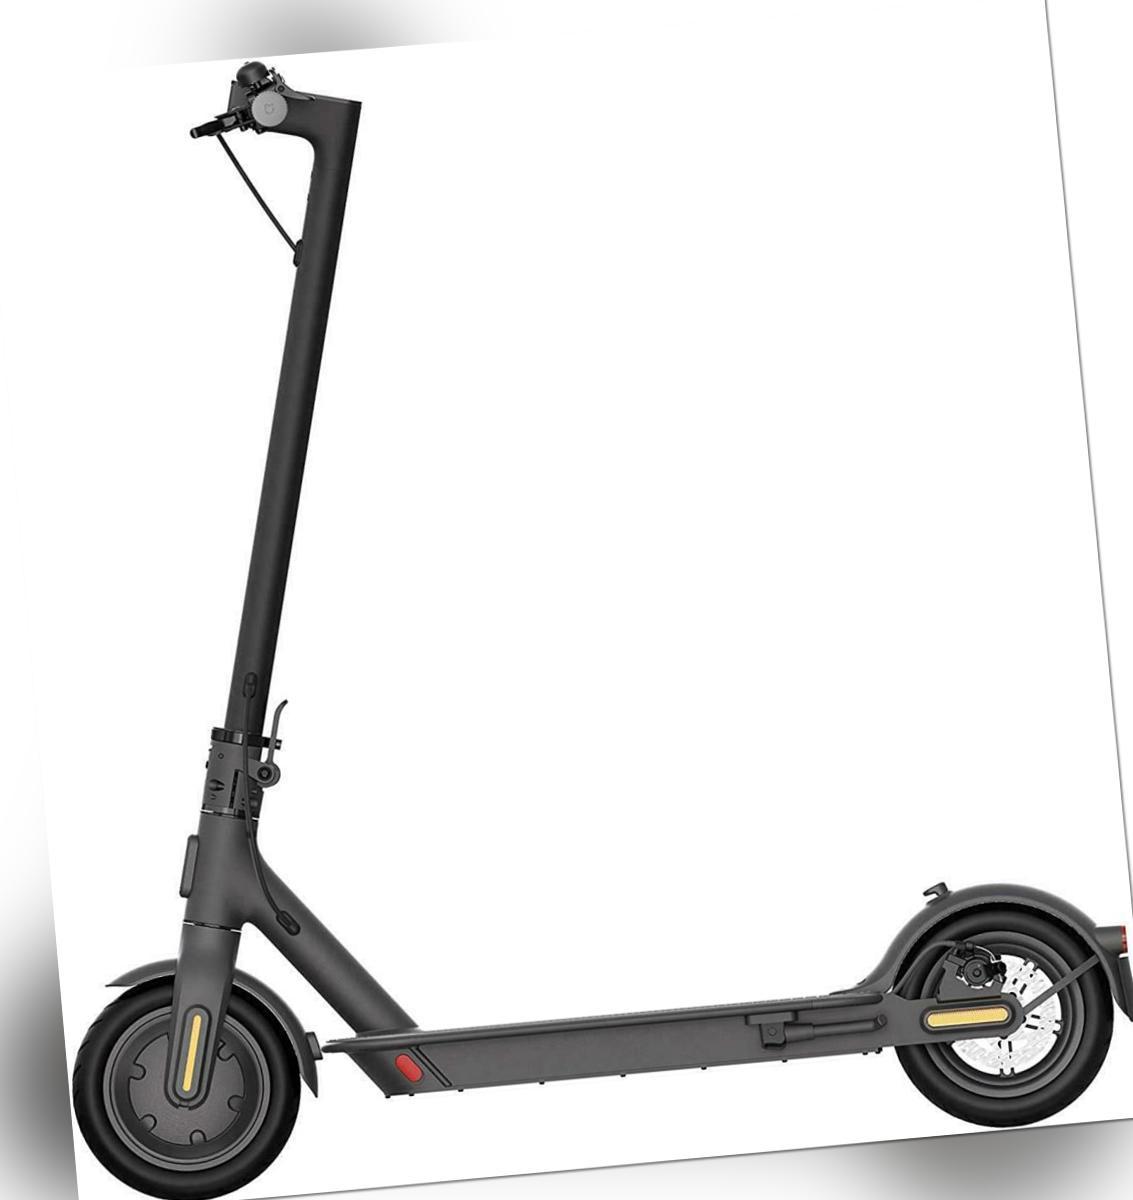 Xiaomi 1S Mi Electric Scooter E-Scooter Faltbar Straßenzulassung Sperrfunktion